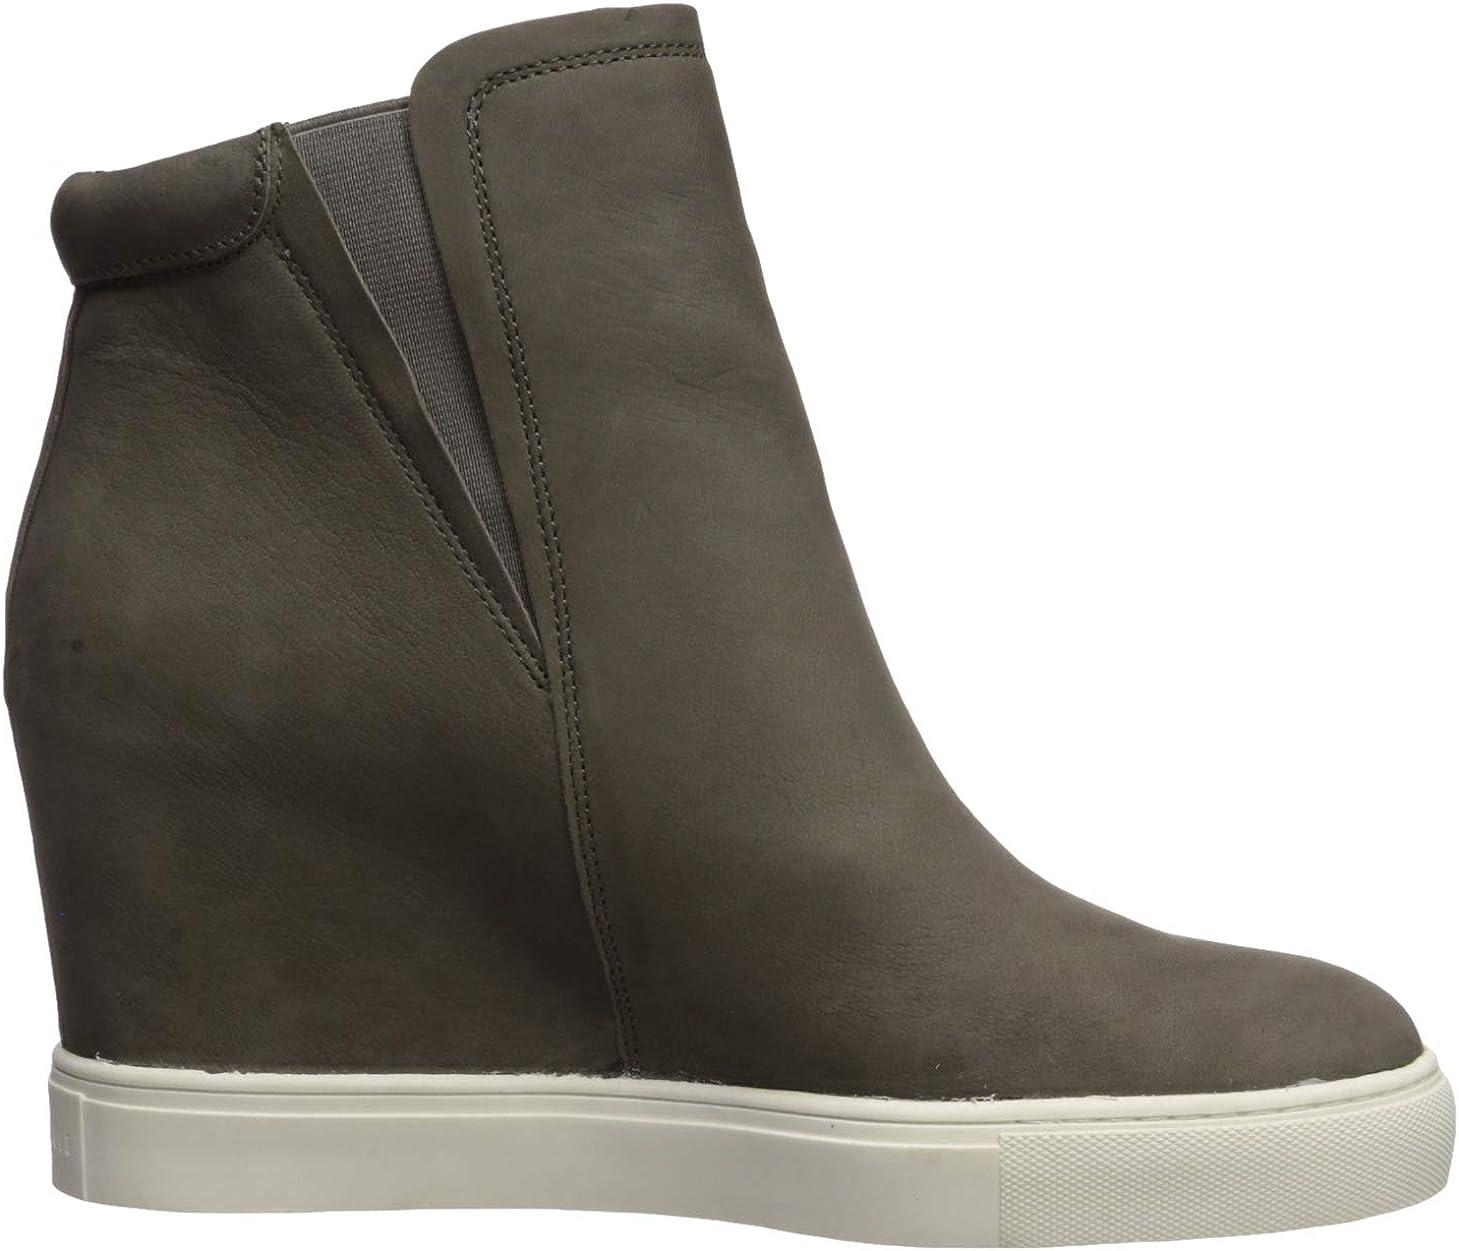 Kenneth Cole New York Women's Kam Wedge Sneaker Cement